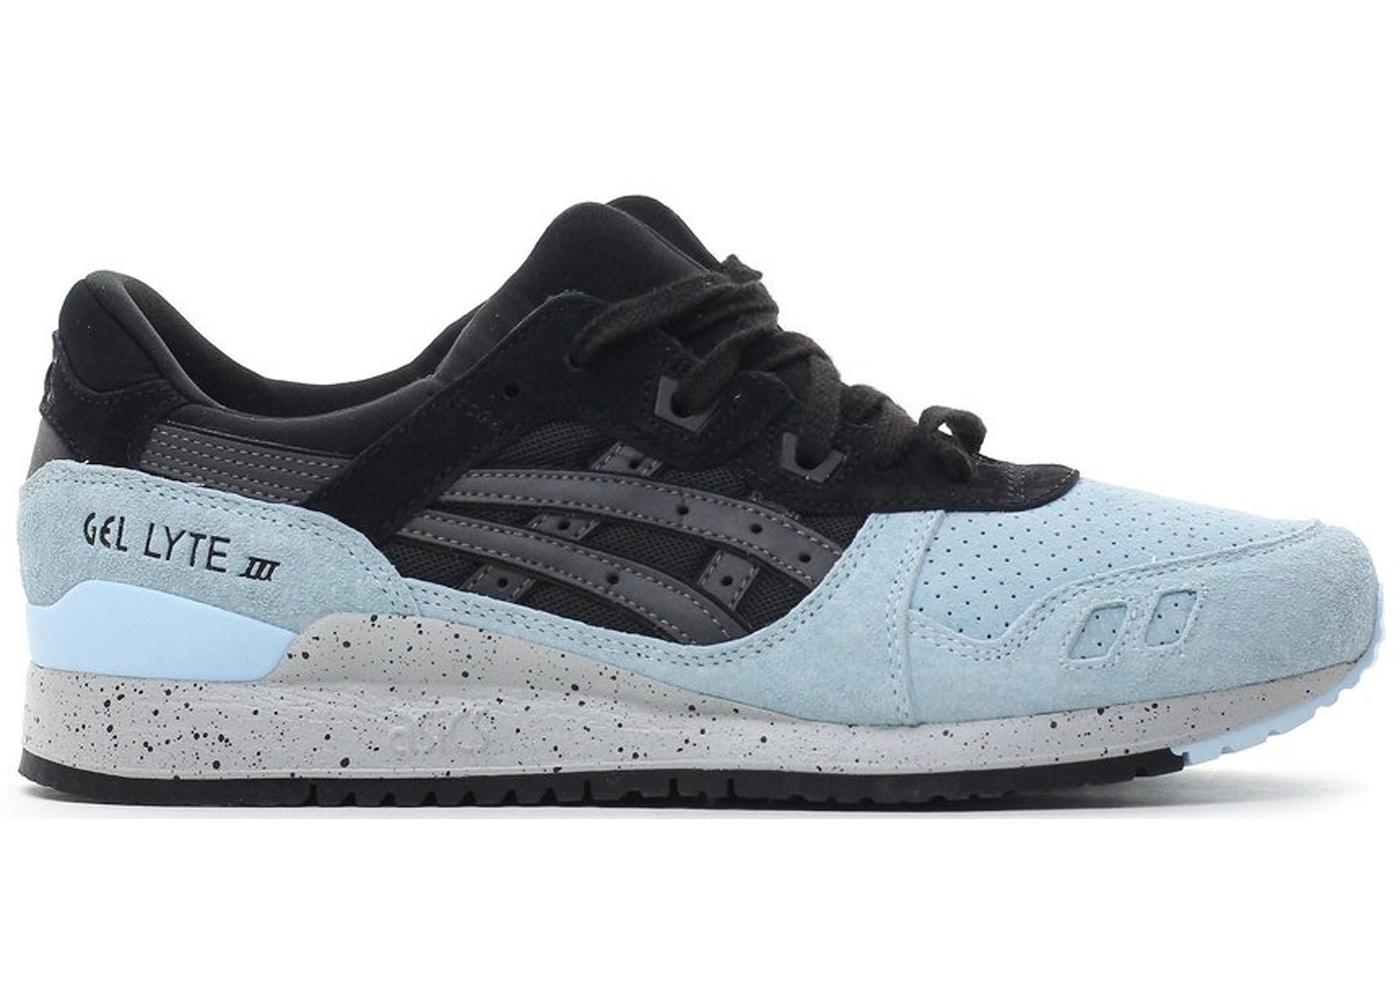 d3d2ace38426 Asics Gel-Lyte III Black Light Blue Speckle Grey - H7M3L-9090